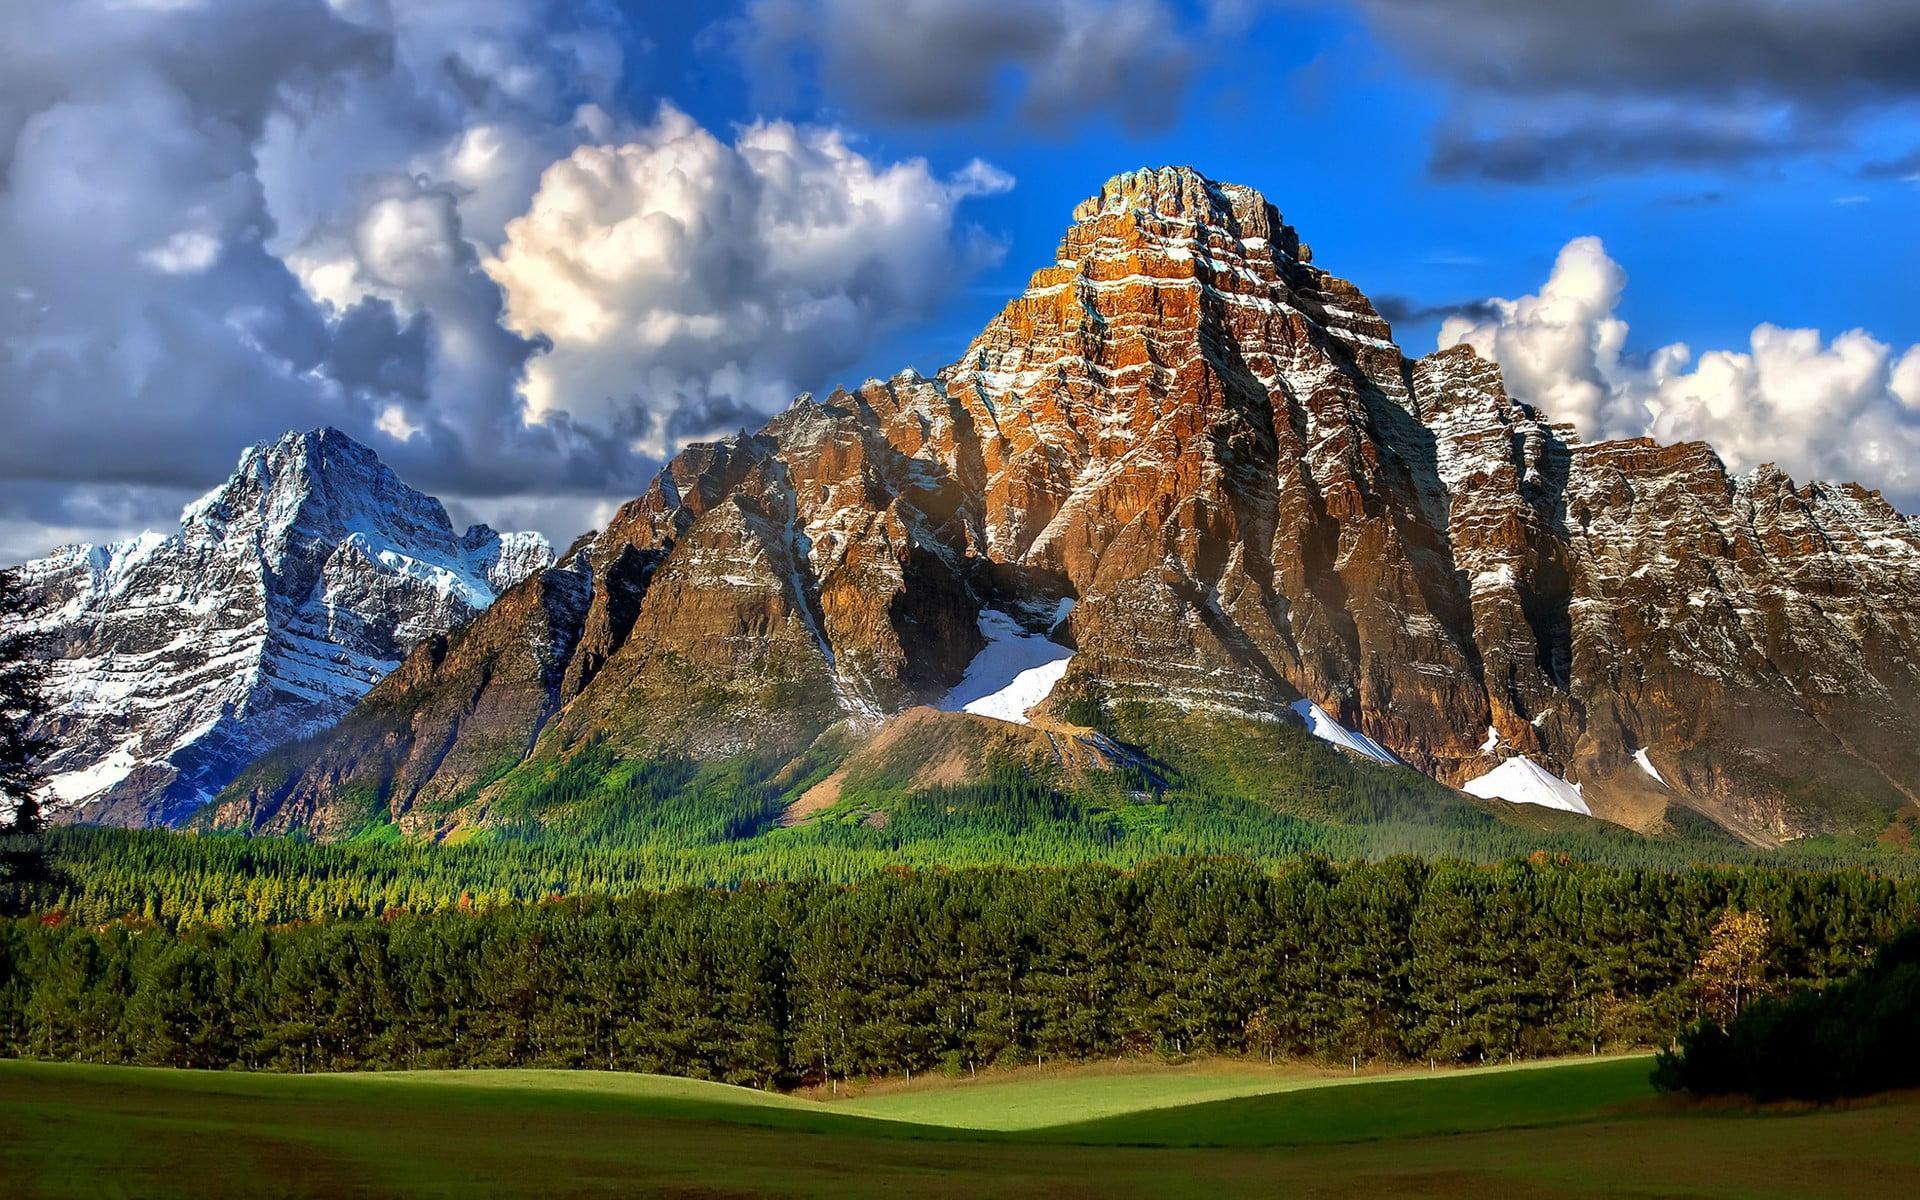 brown rocky mountain landscape